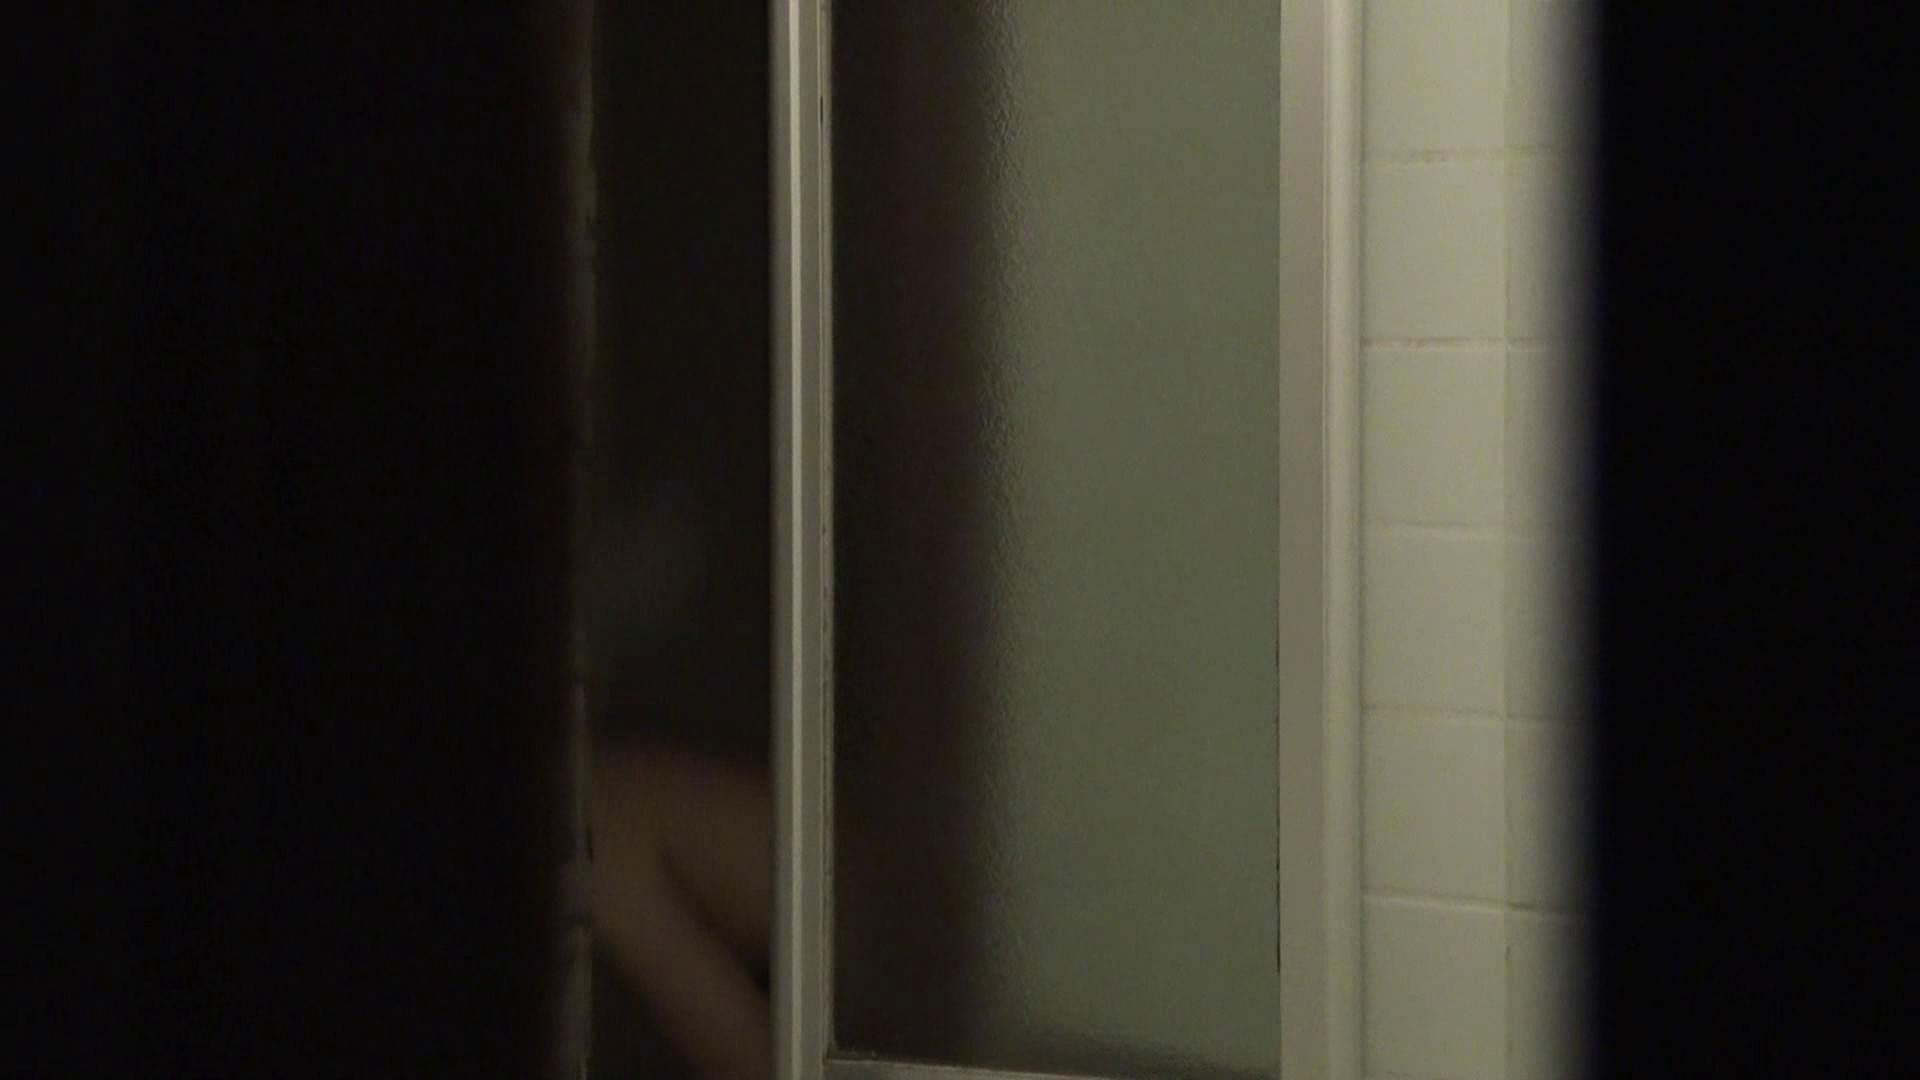 vol.06顔を洗い流す極上お女市さんの裸体をハイビジョンで!風呂上り着替え必見! 美人編 戯れ無修正画像 68画像 22